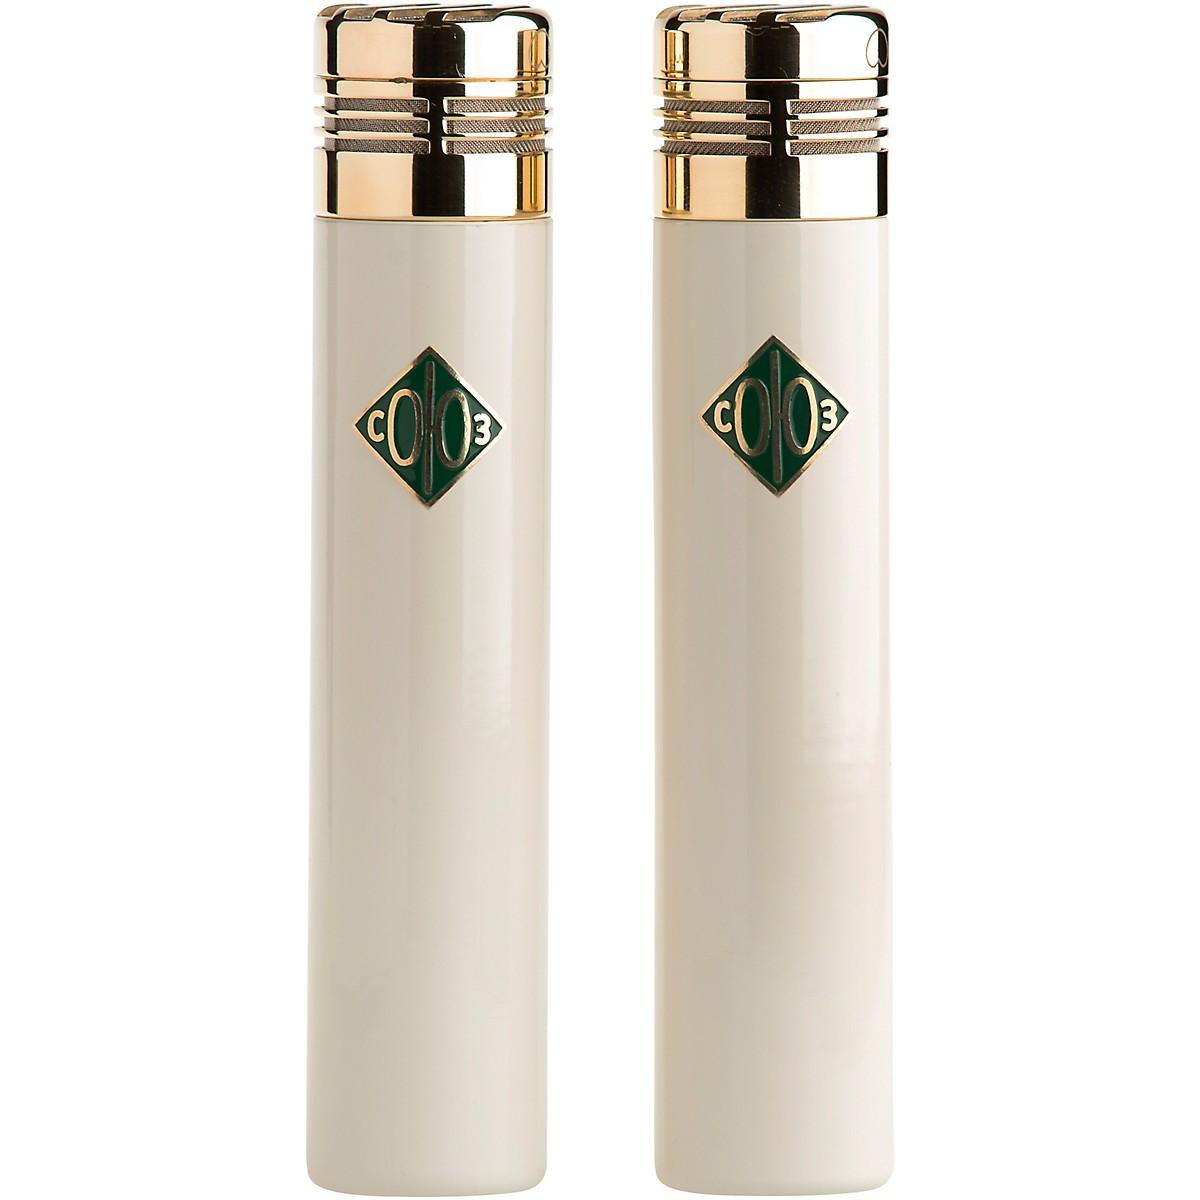 Soyuz Microphones 013 FET-M Matched Pair Small Diaphragm FET Microphones (cardioid capsule, 10dB pad)